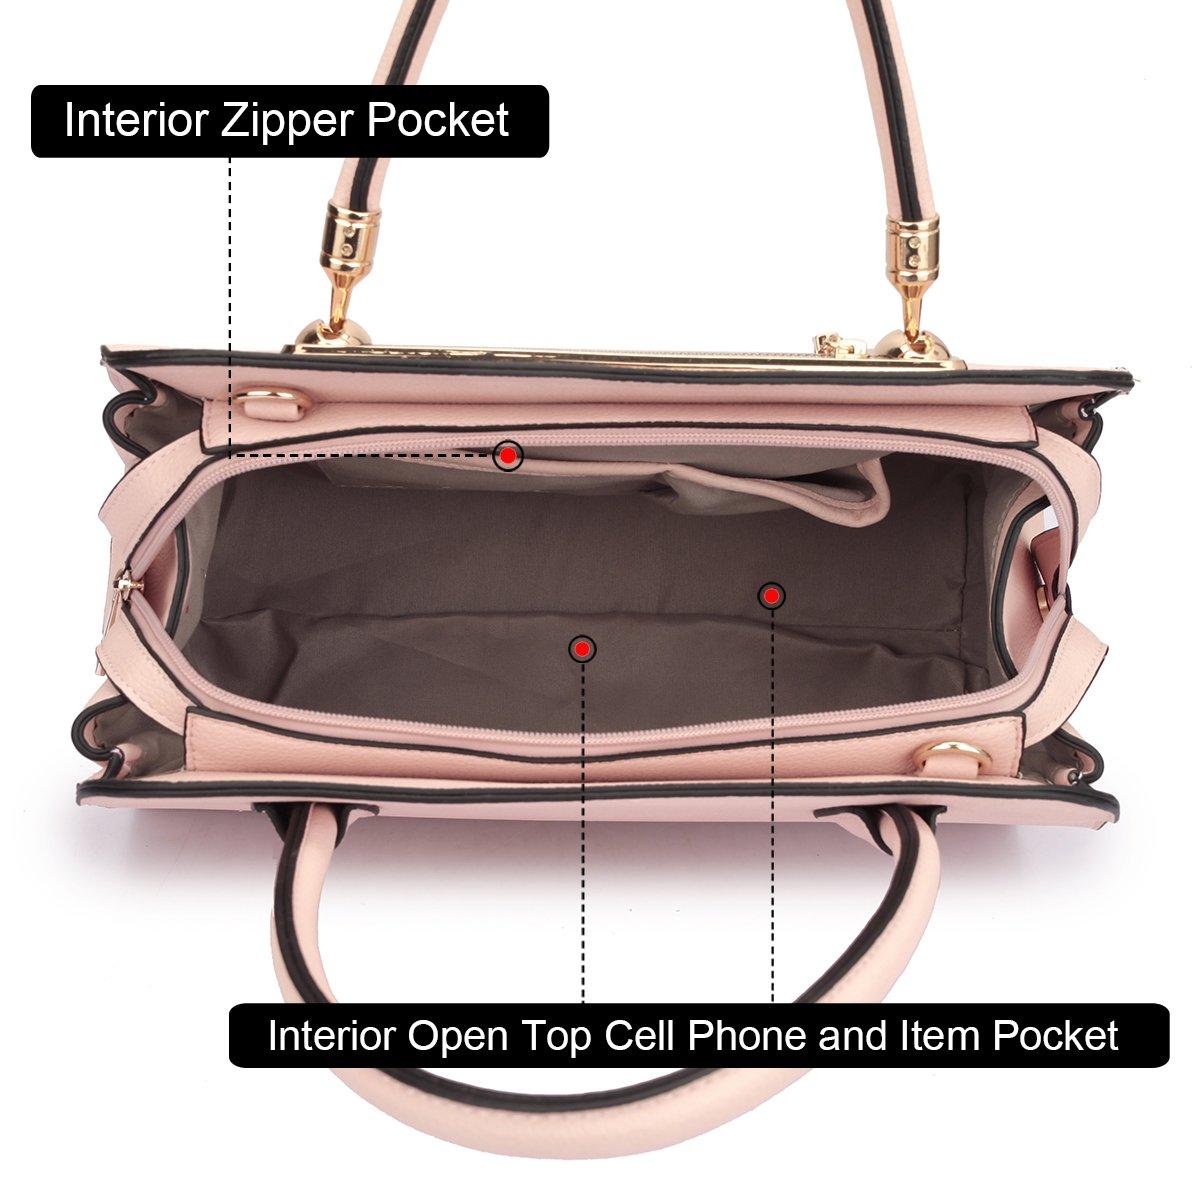 Women Structured Satchel Bags Vegan Leather Handbag Top Handle Purse Fashion Shoulder Bag with Fringed Tassel by Dasein (Image #5)